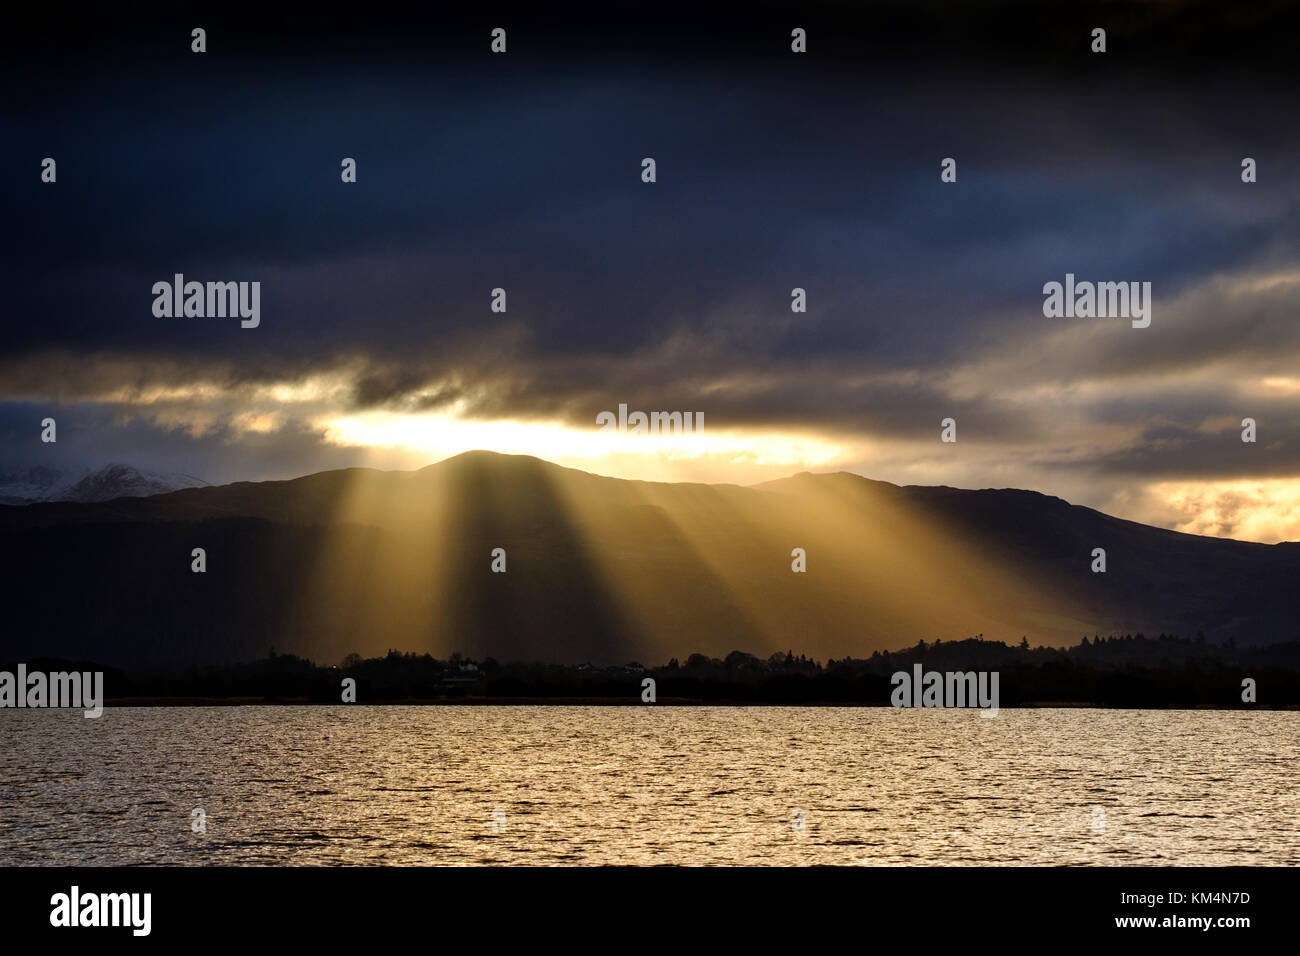 Morning light over Dodd, Bassenthwaite Lake, The Lake District, Cumbria, UK - Stock Image